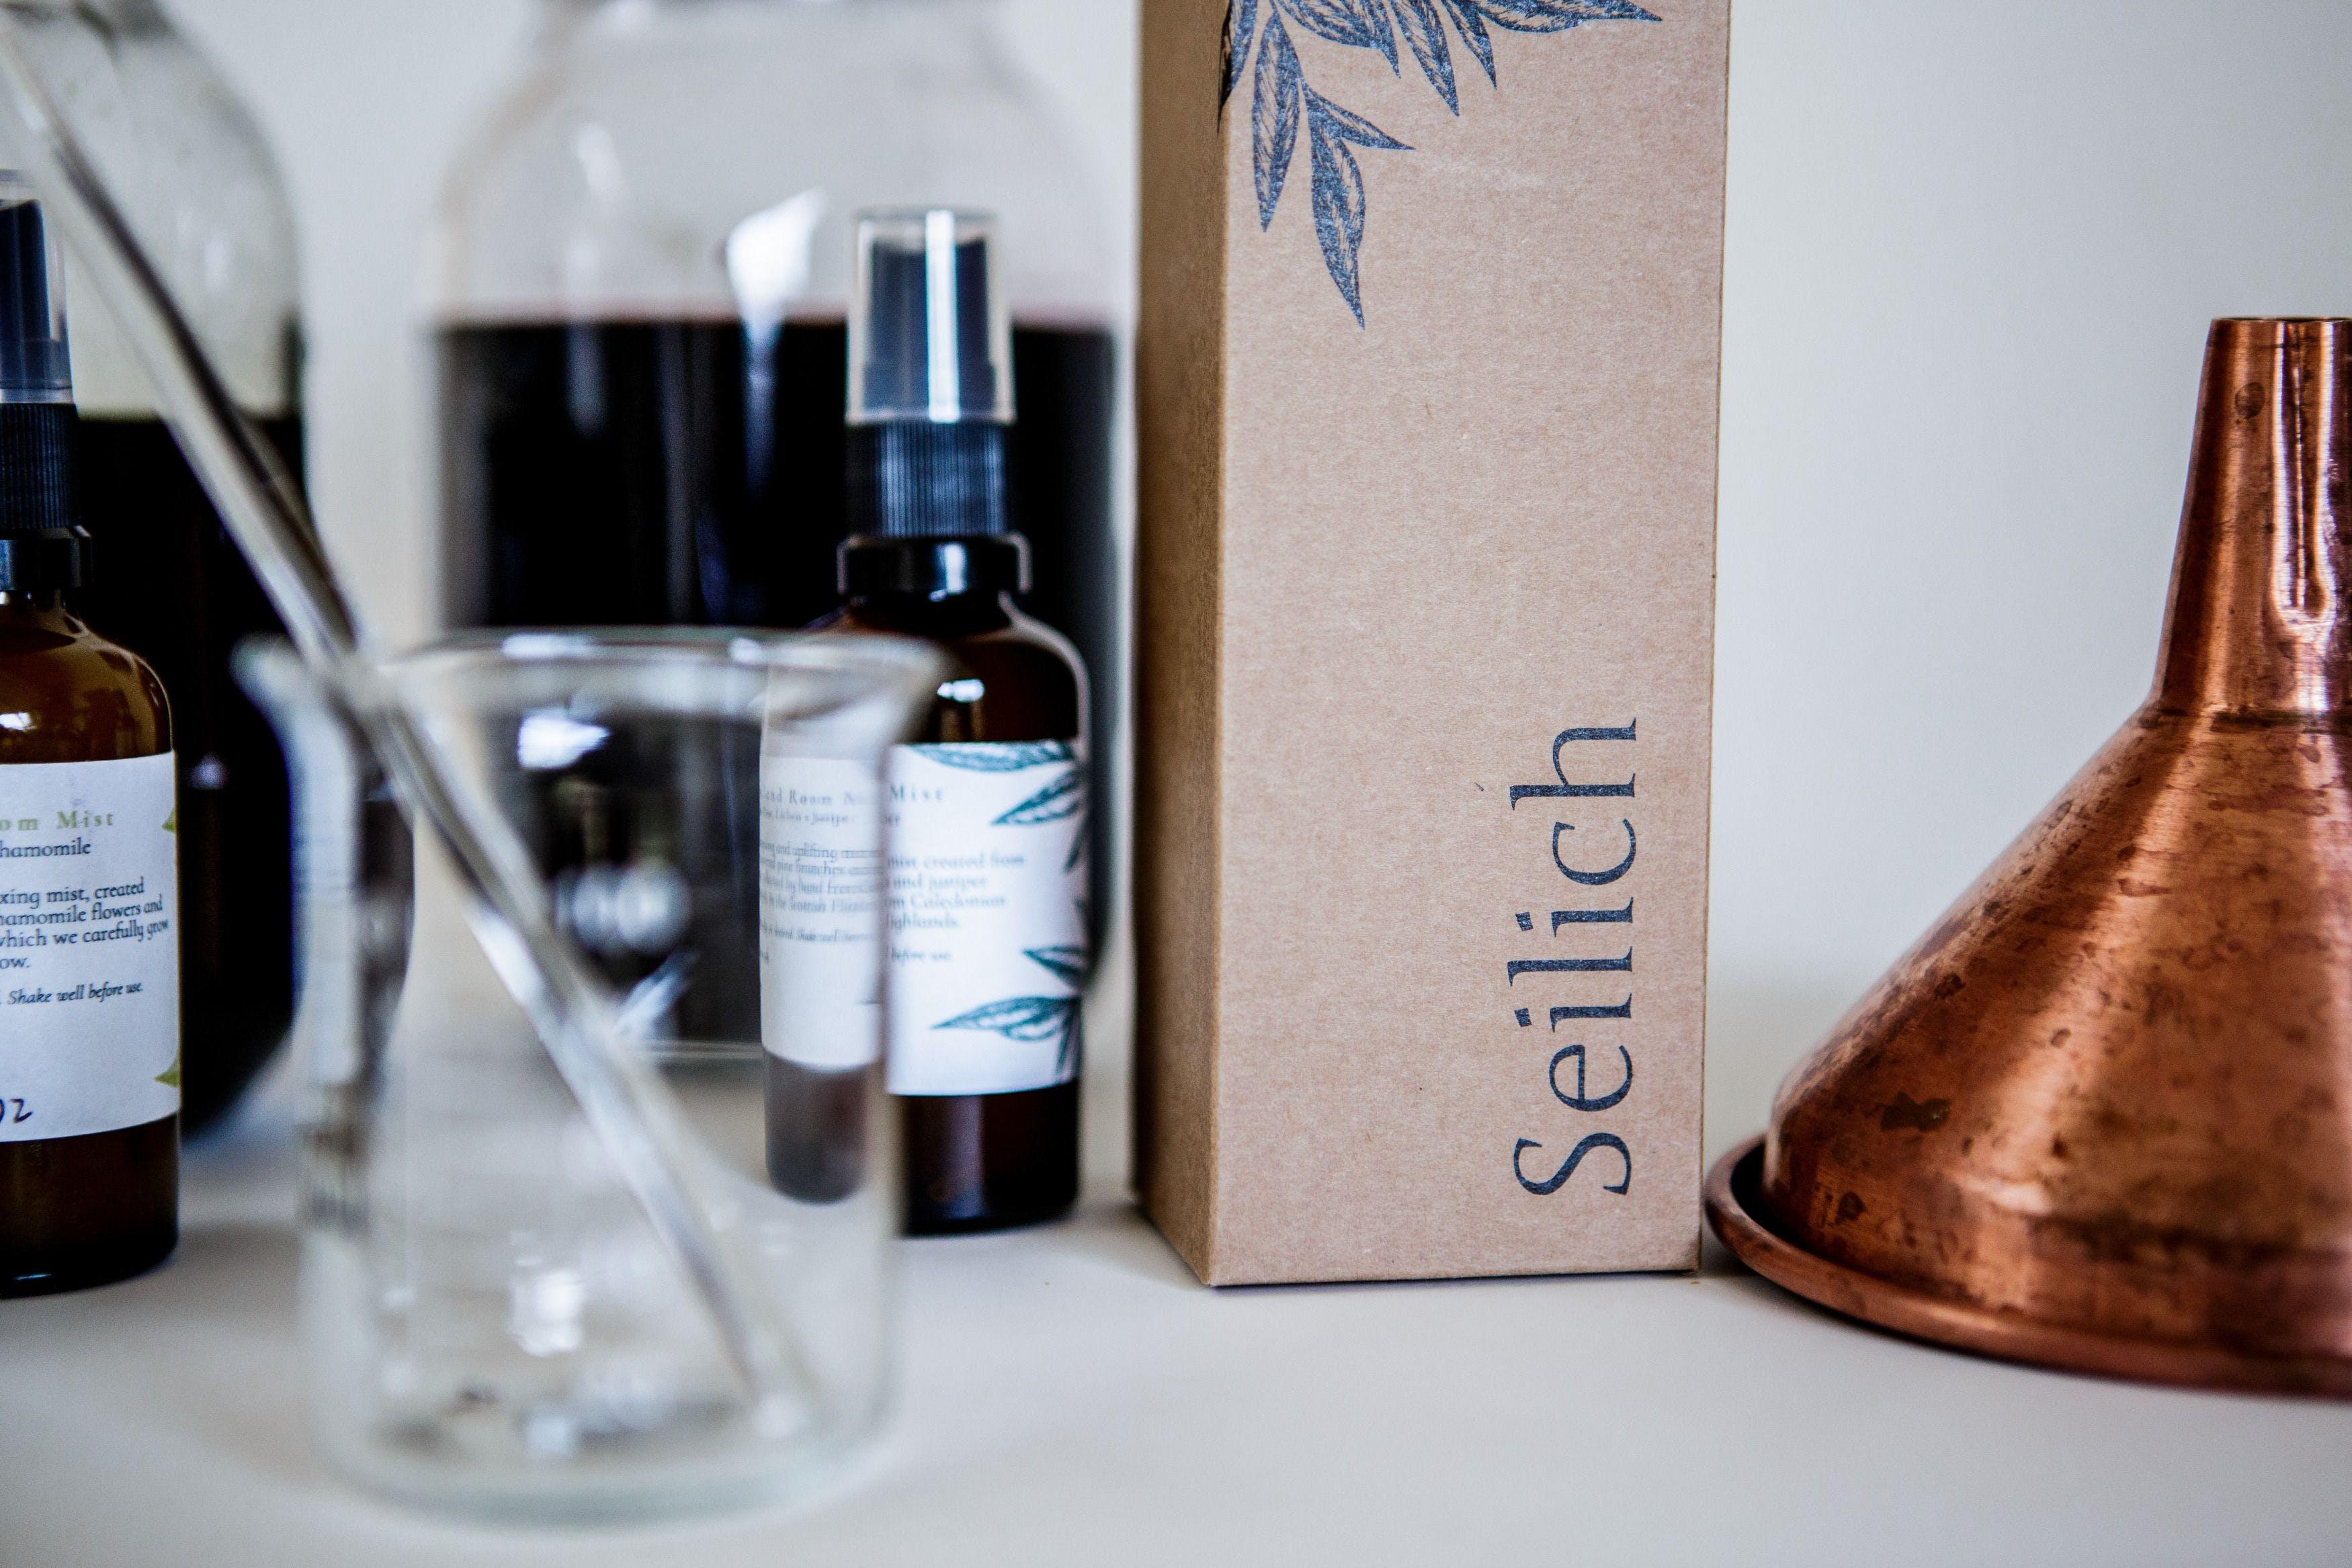 Seilich Botanicals wildlife friendly and sustainable skincare set